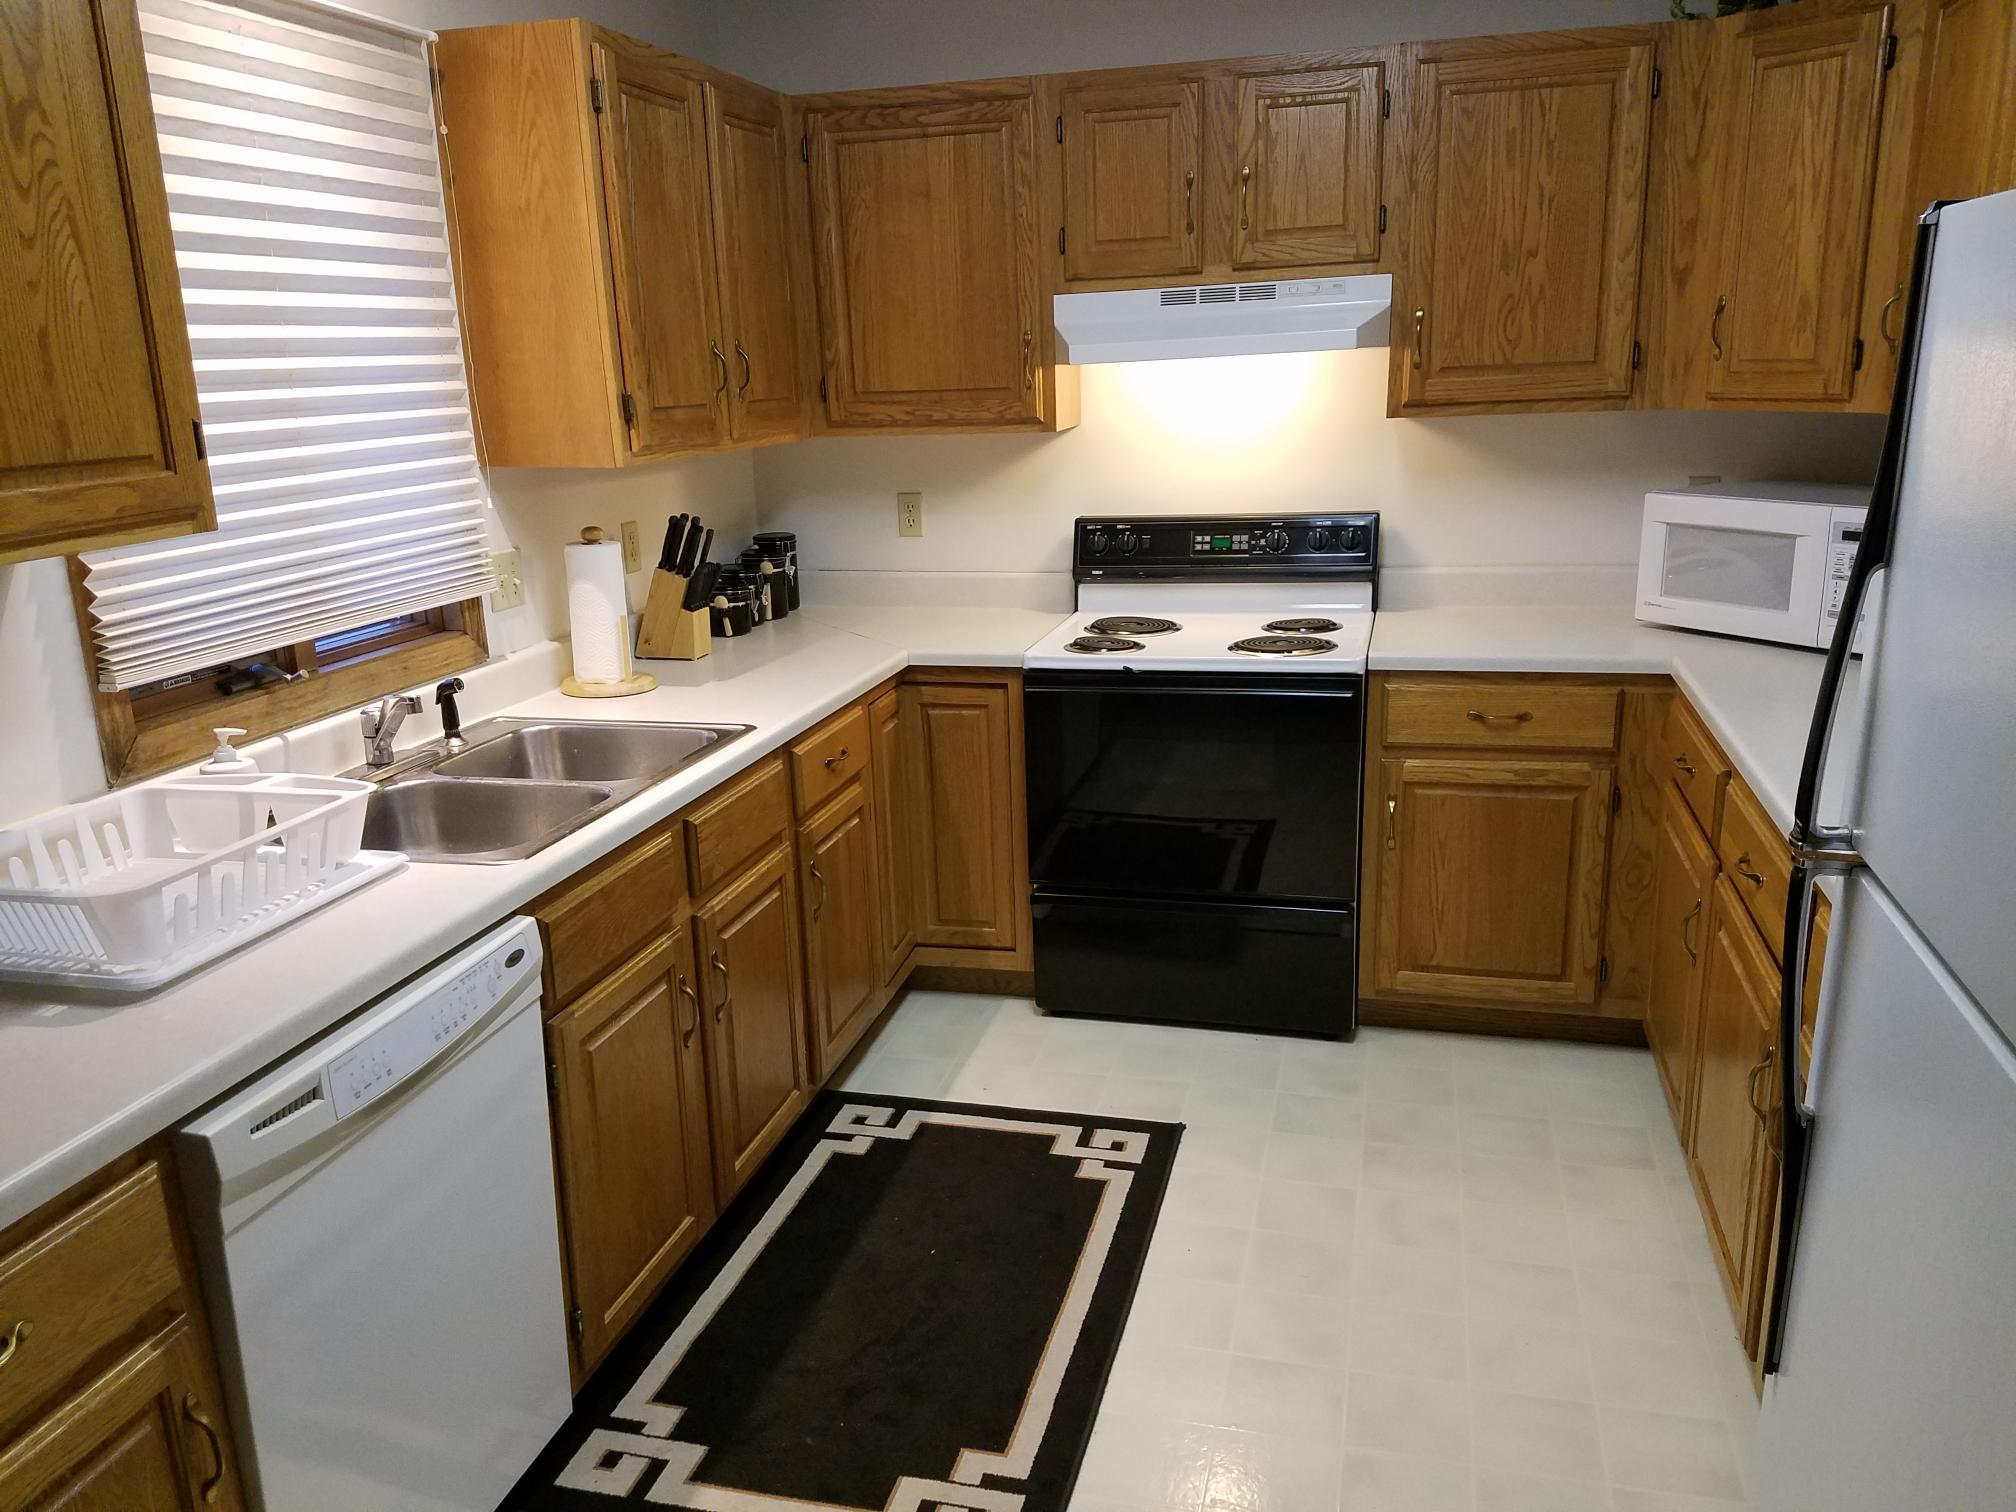 C-Kitchen 1.jpeg